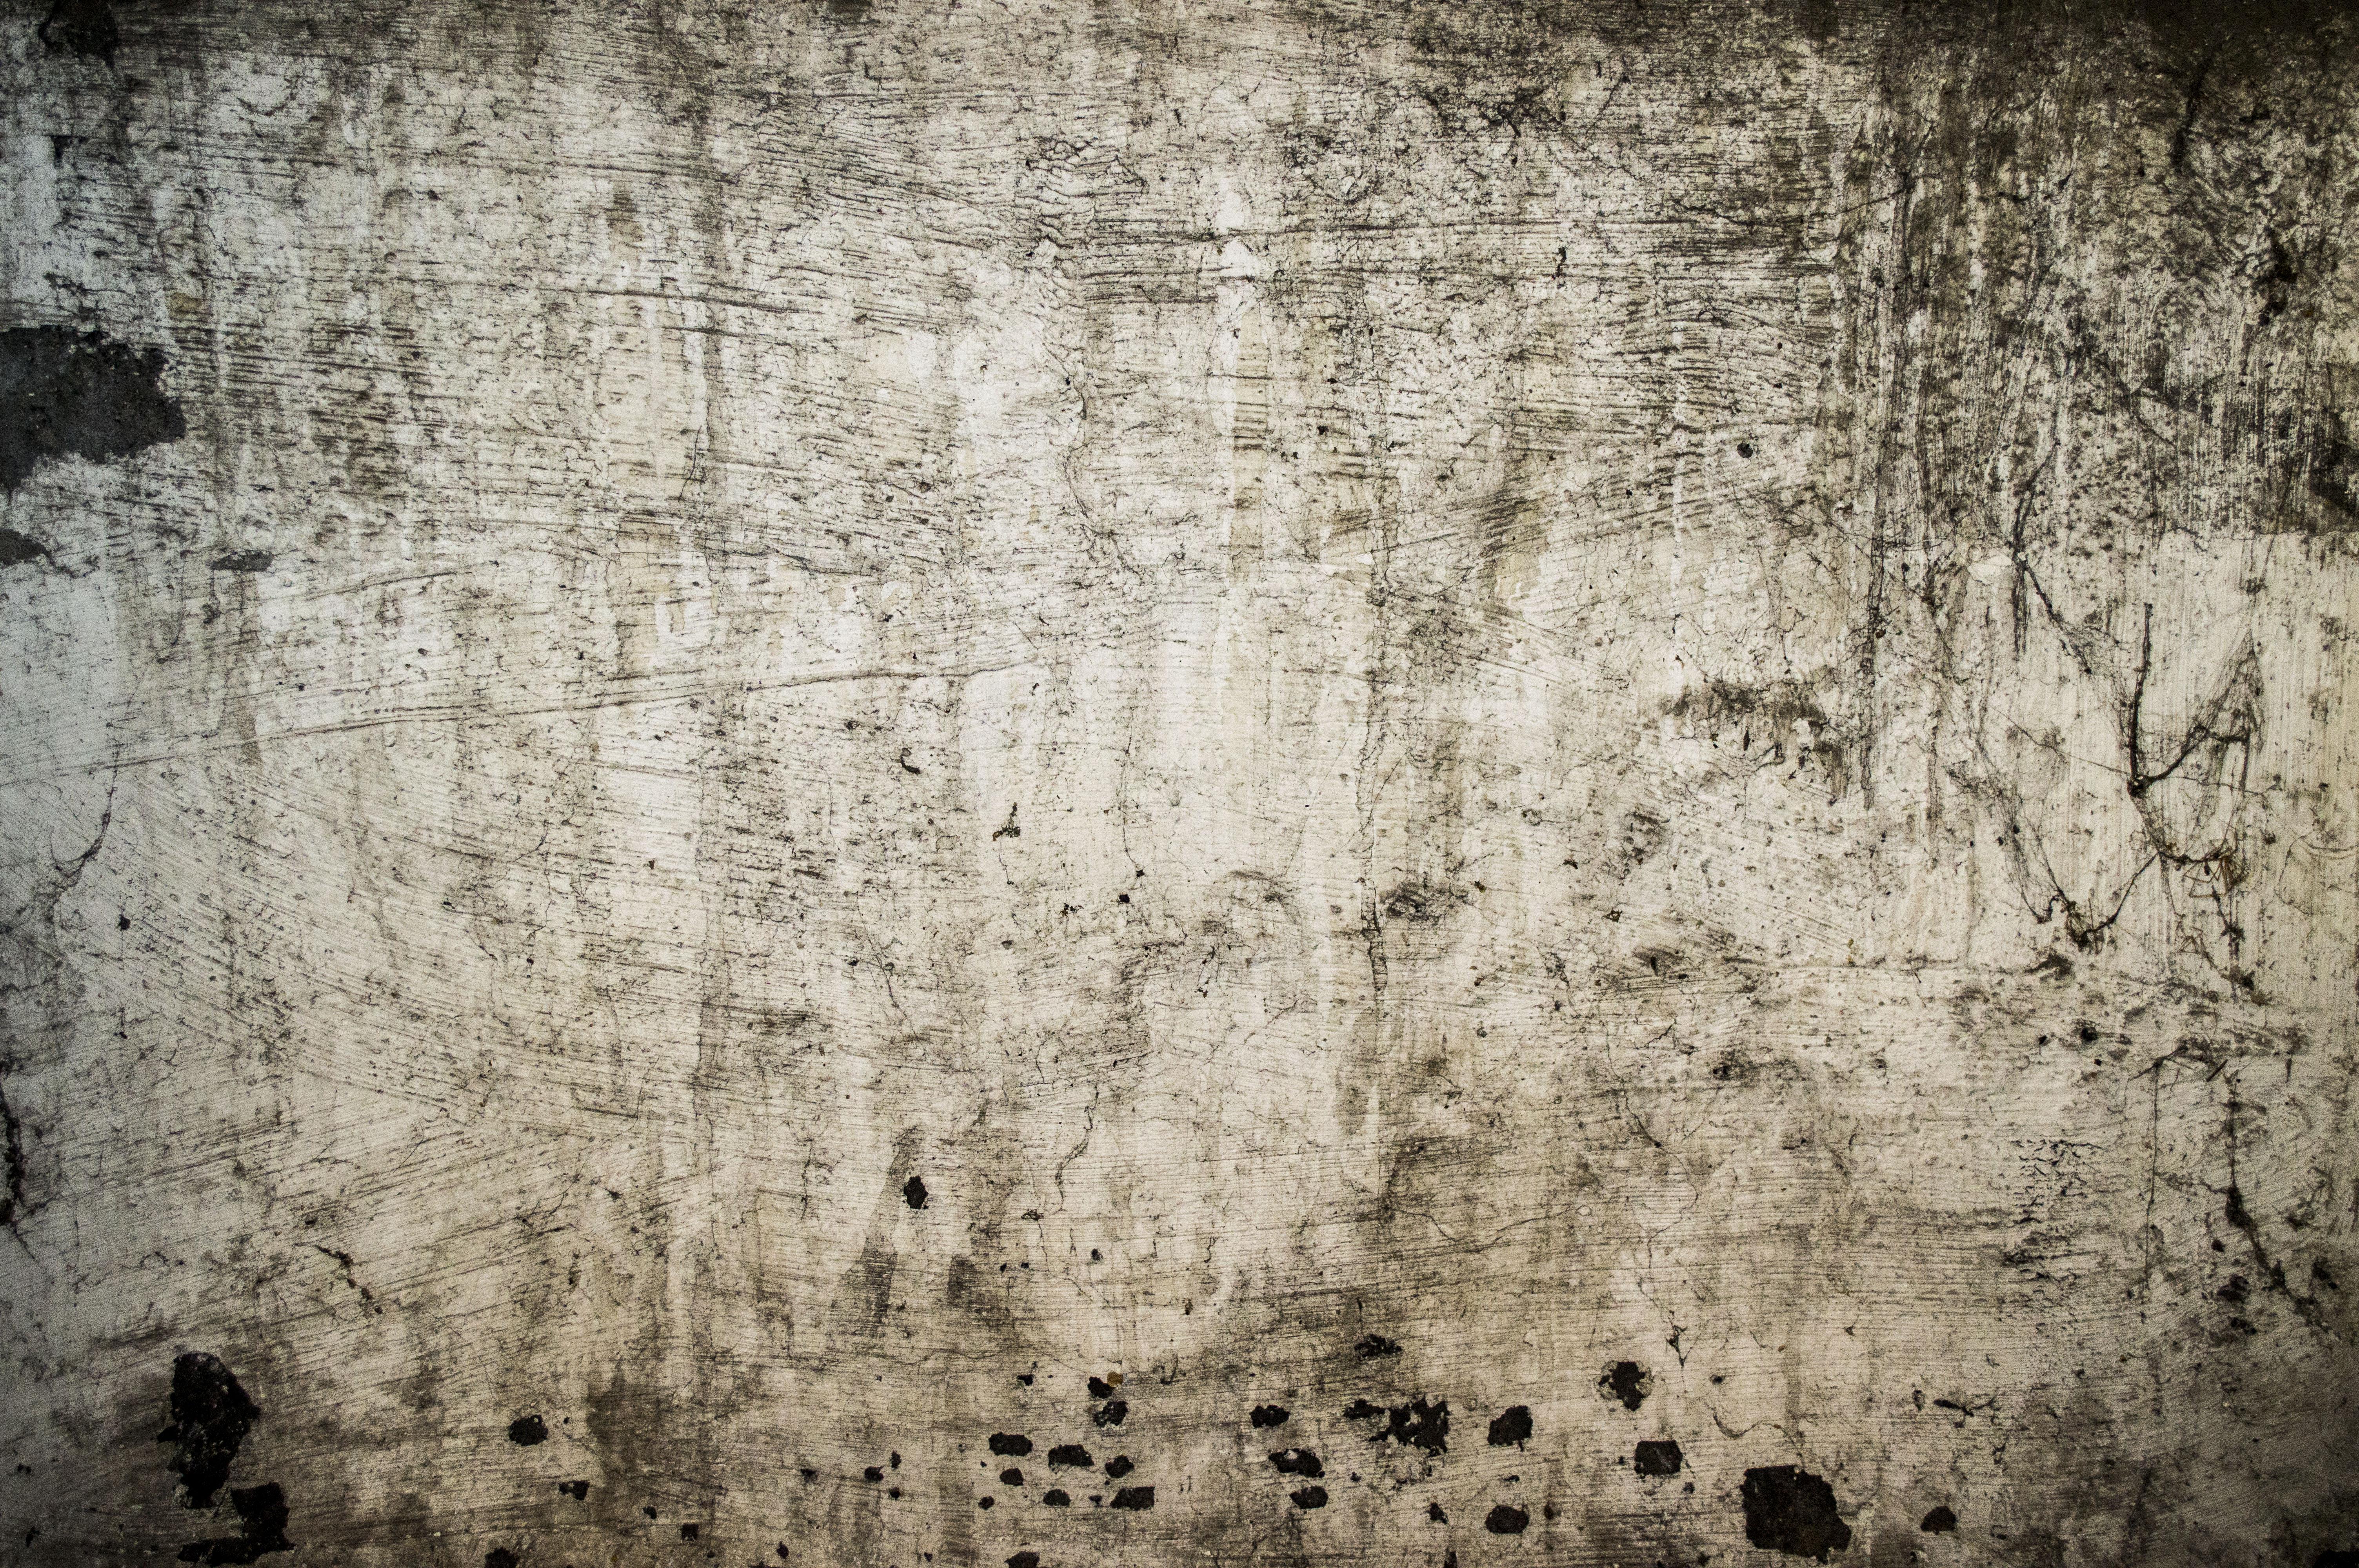 Grunge Stone Wall Texture by sherbatzky on DeviantArt